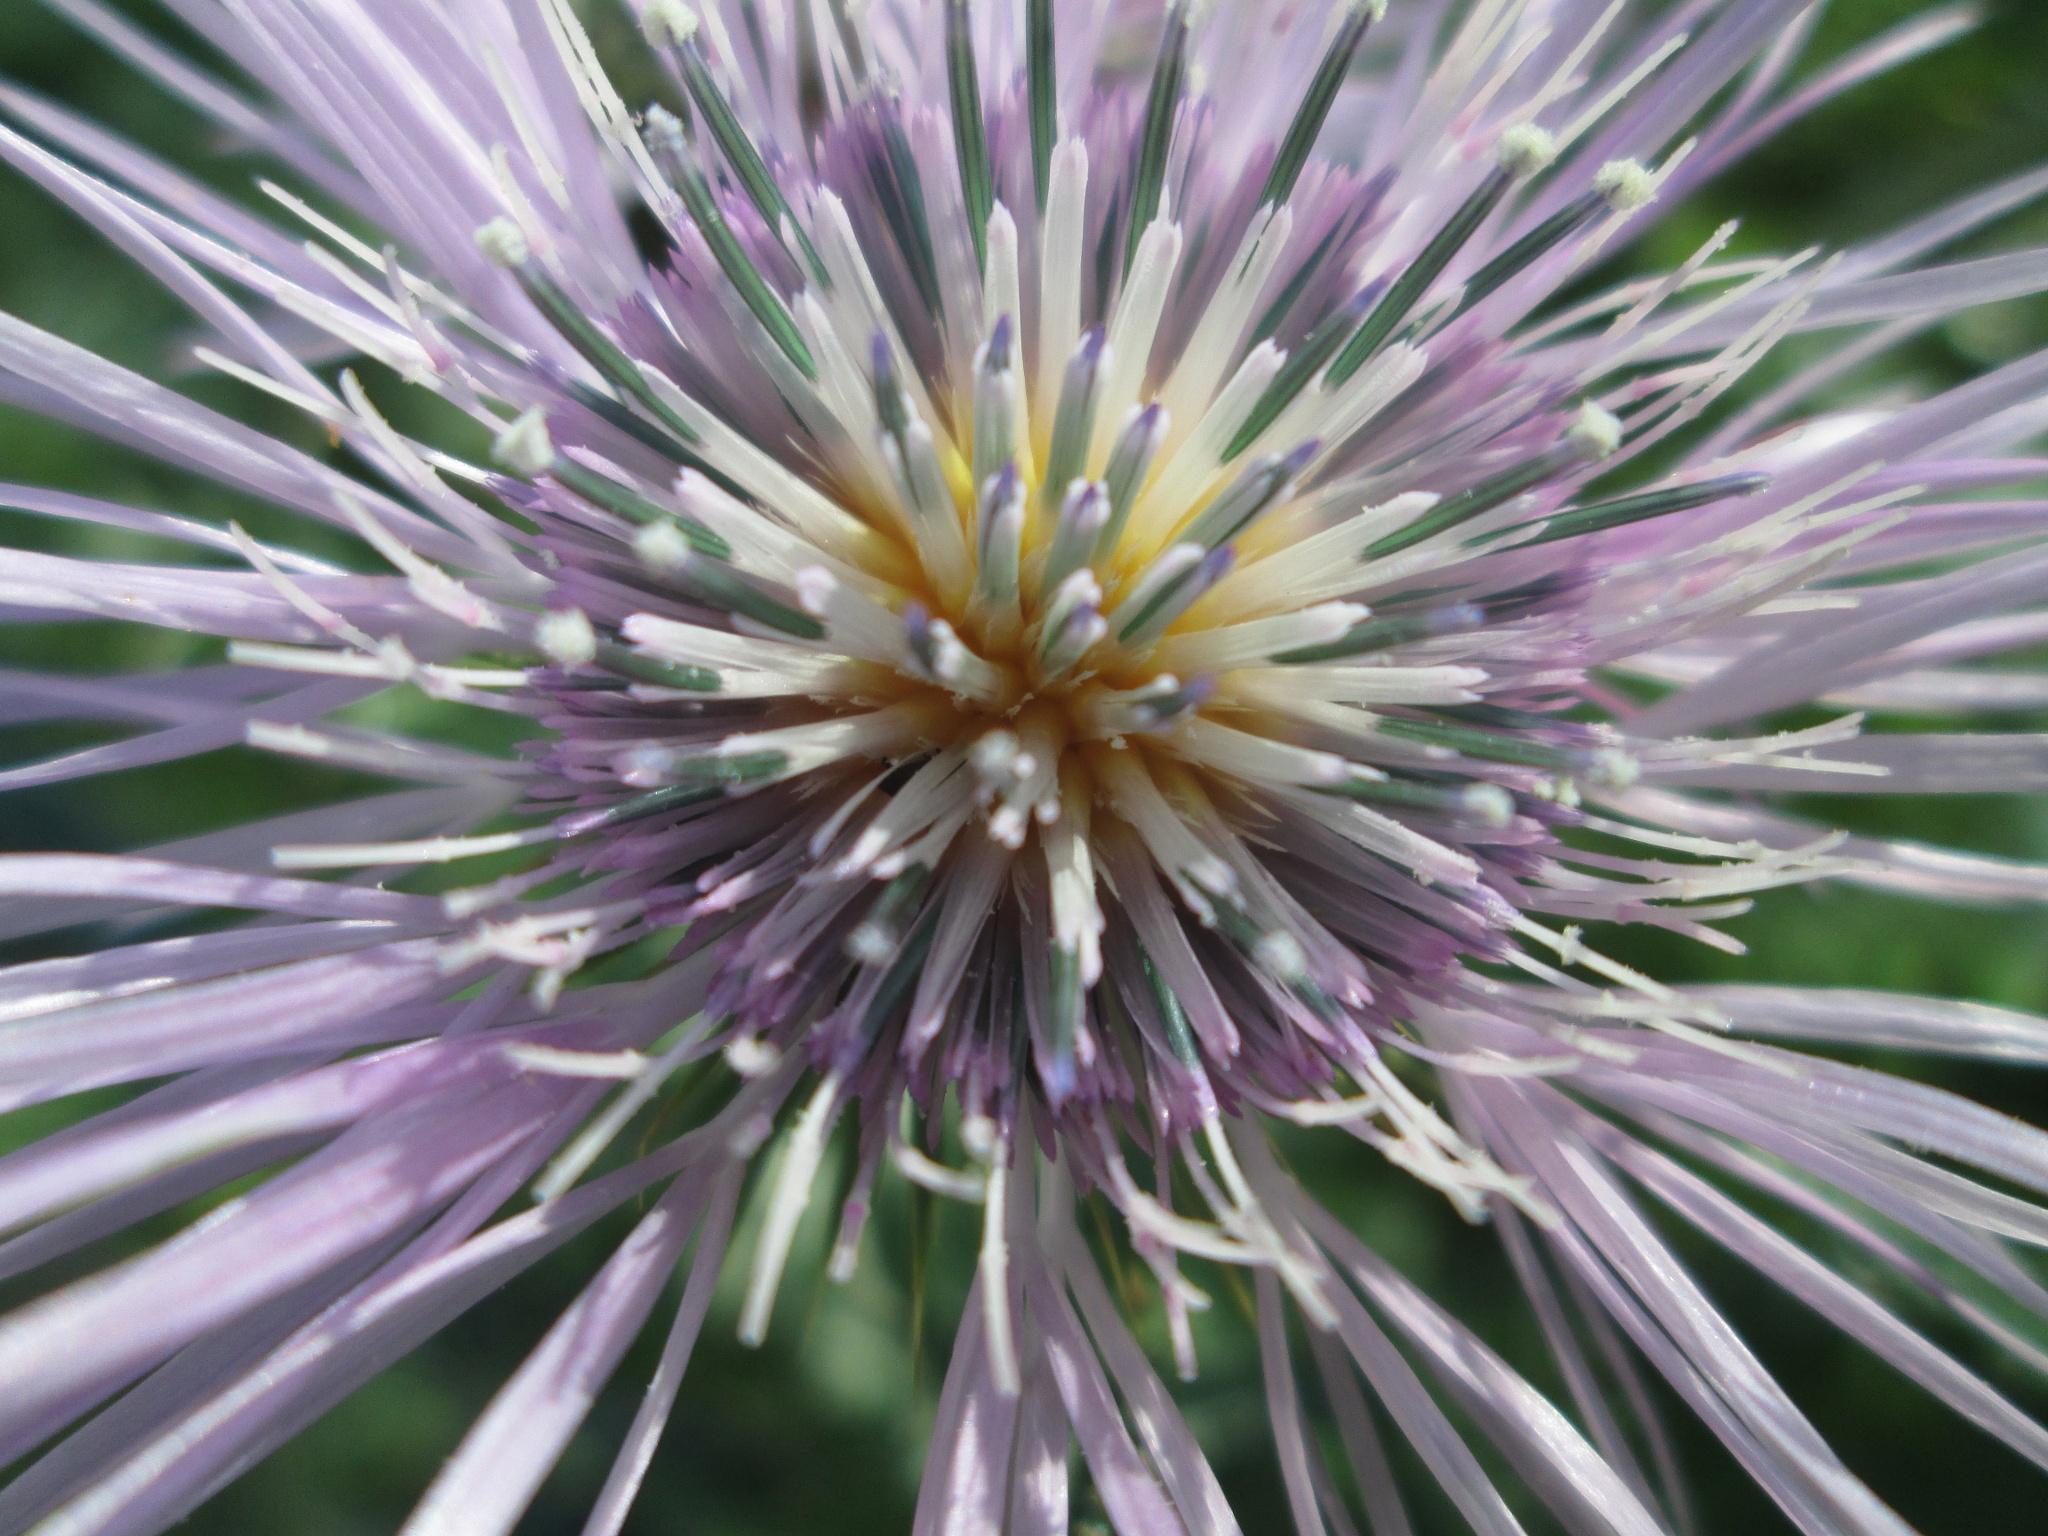 Wild Flower by michaelwrescz